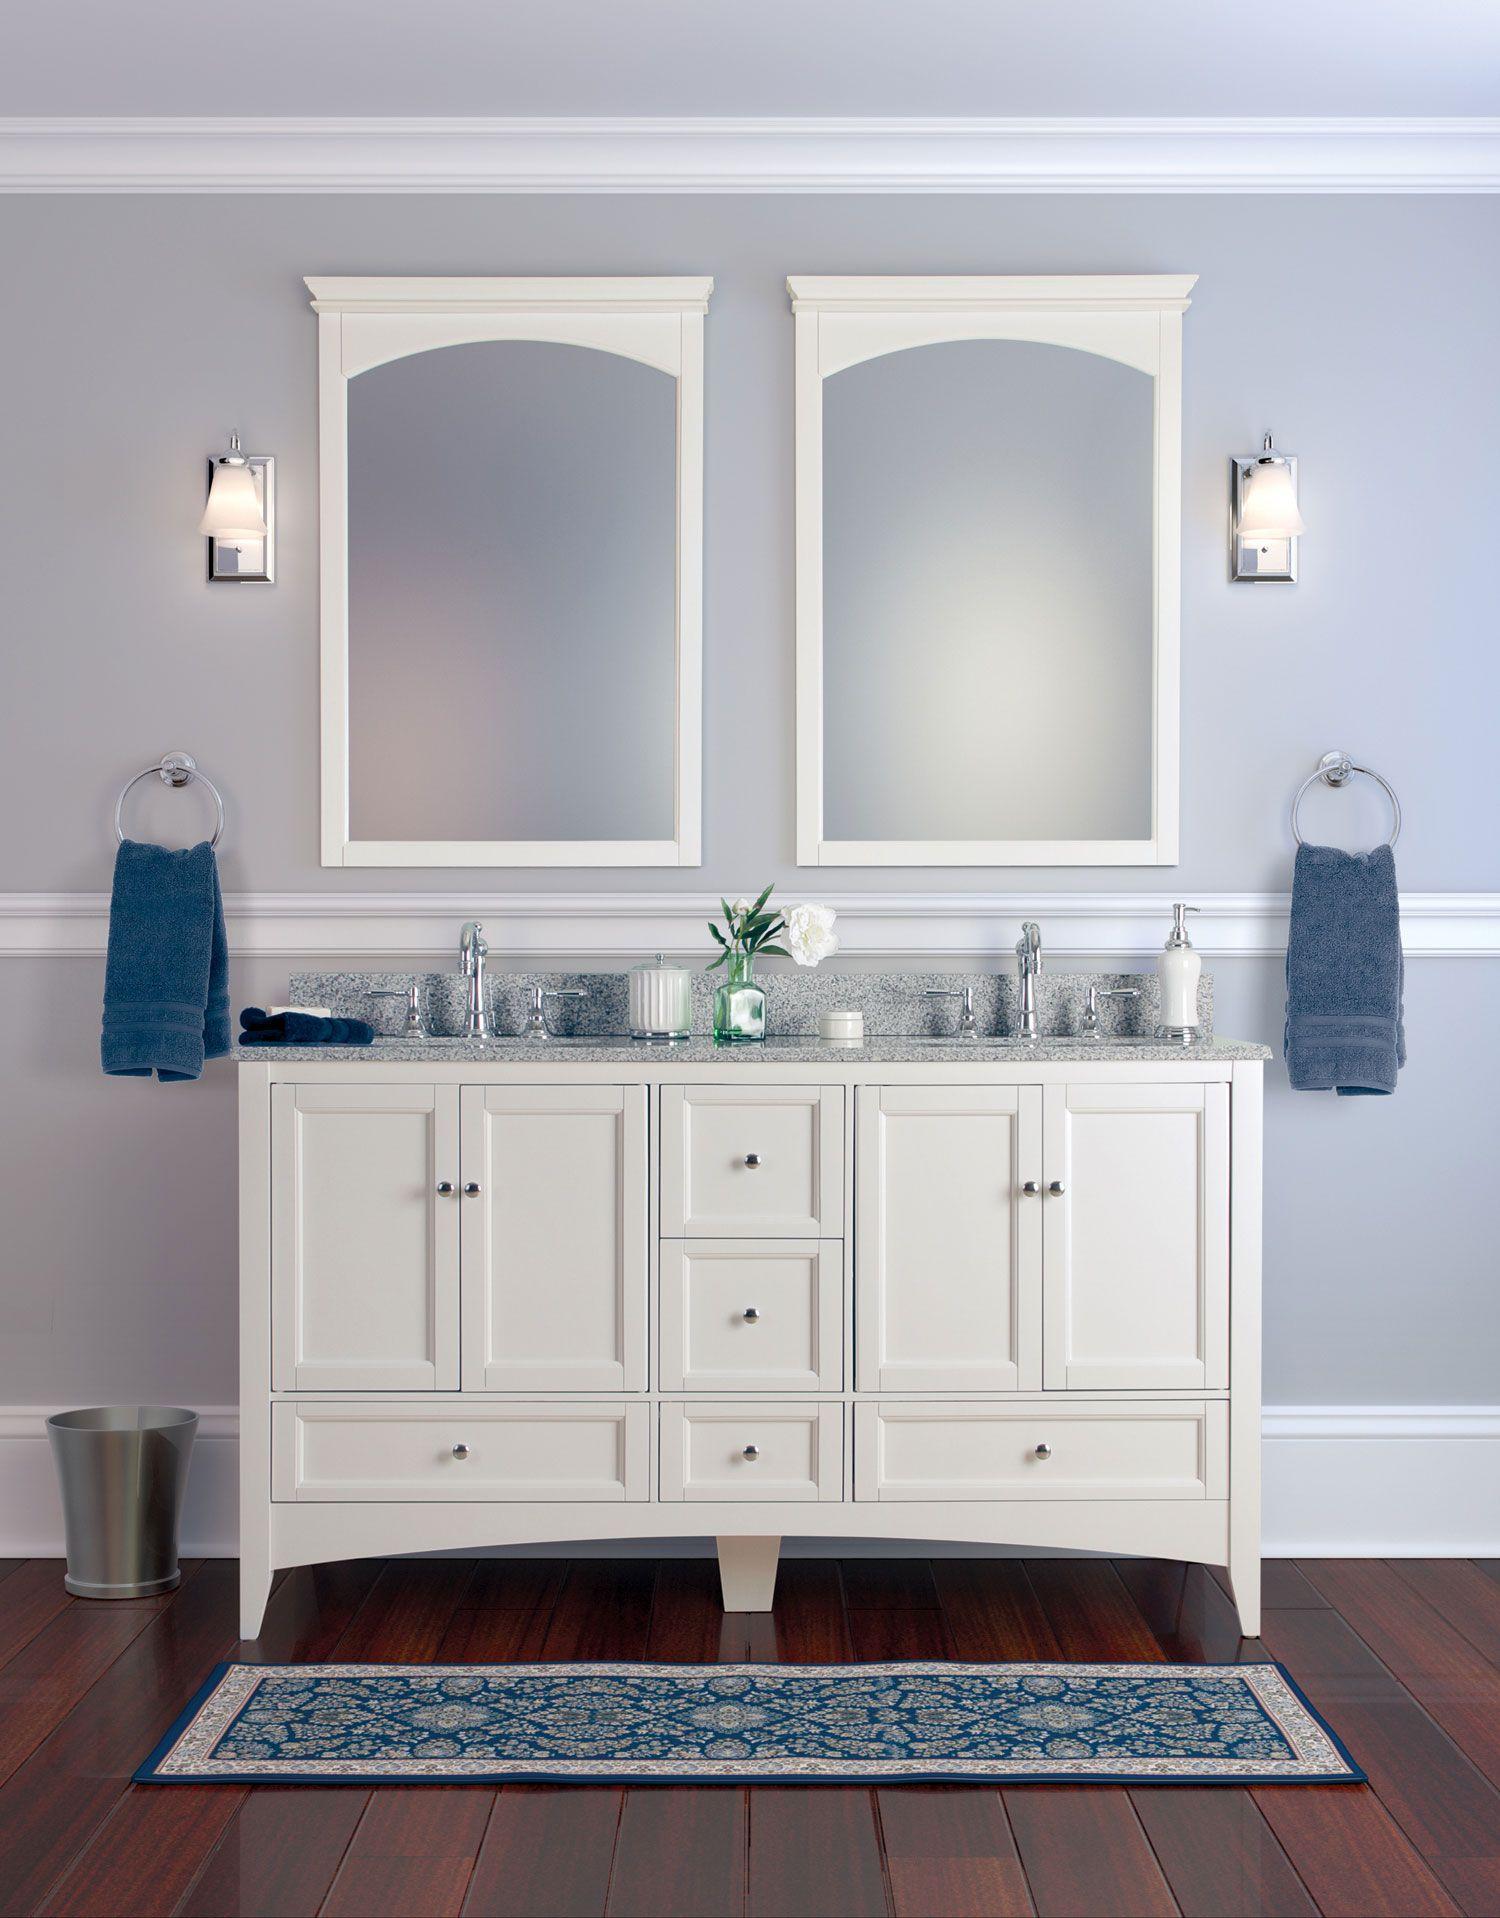 Amazing Wooden Flooring Design Ideas With Bathroom Vanity Cabinets